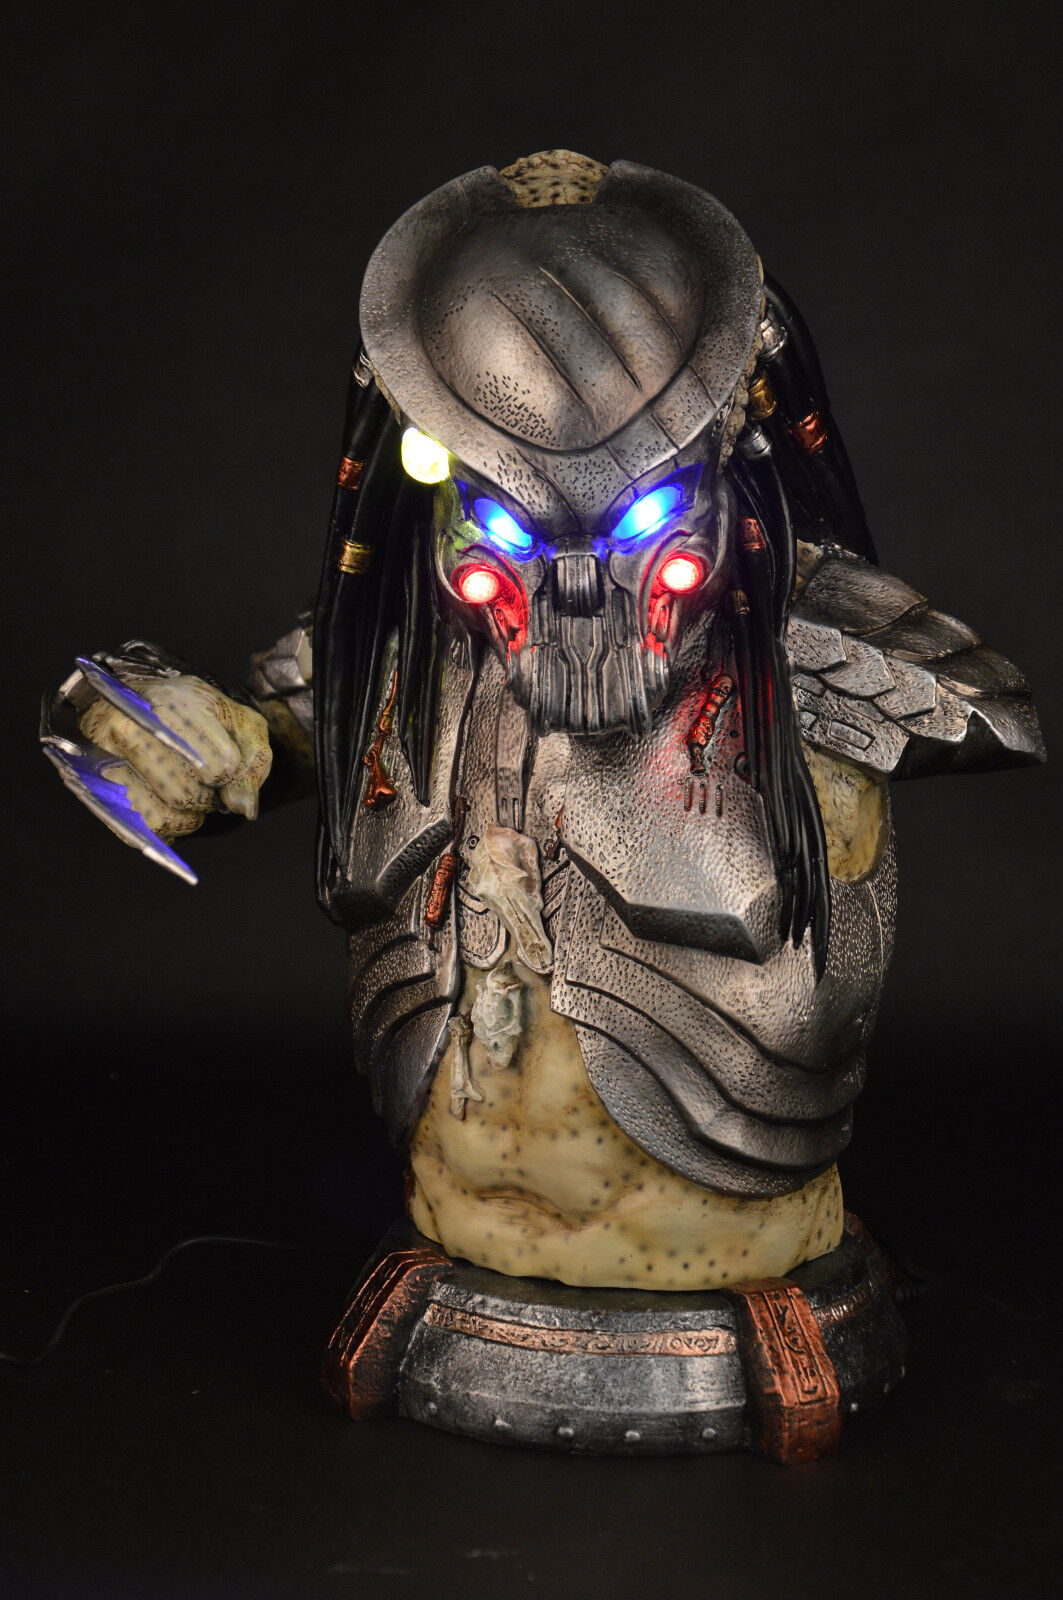 ProssoALIEN Prossoator Alien Life Size Resin Figure Bust Statue Collectible LED EYES